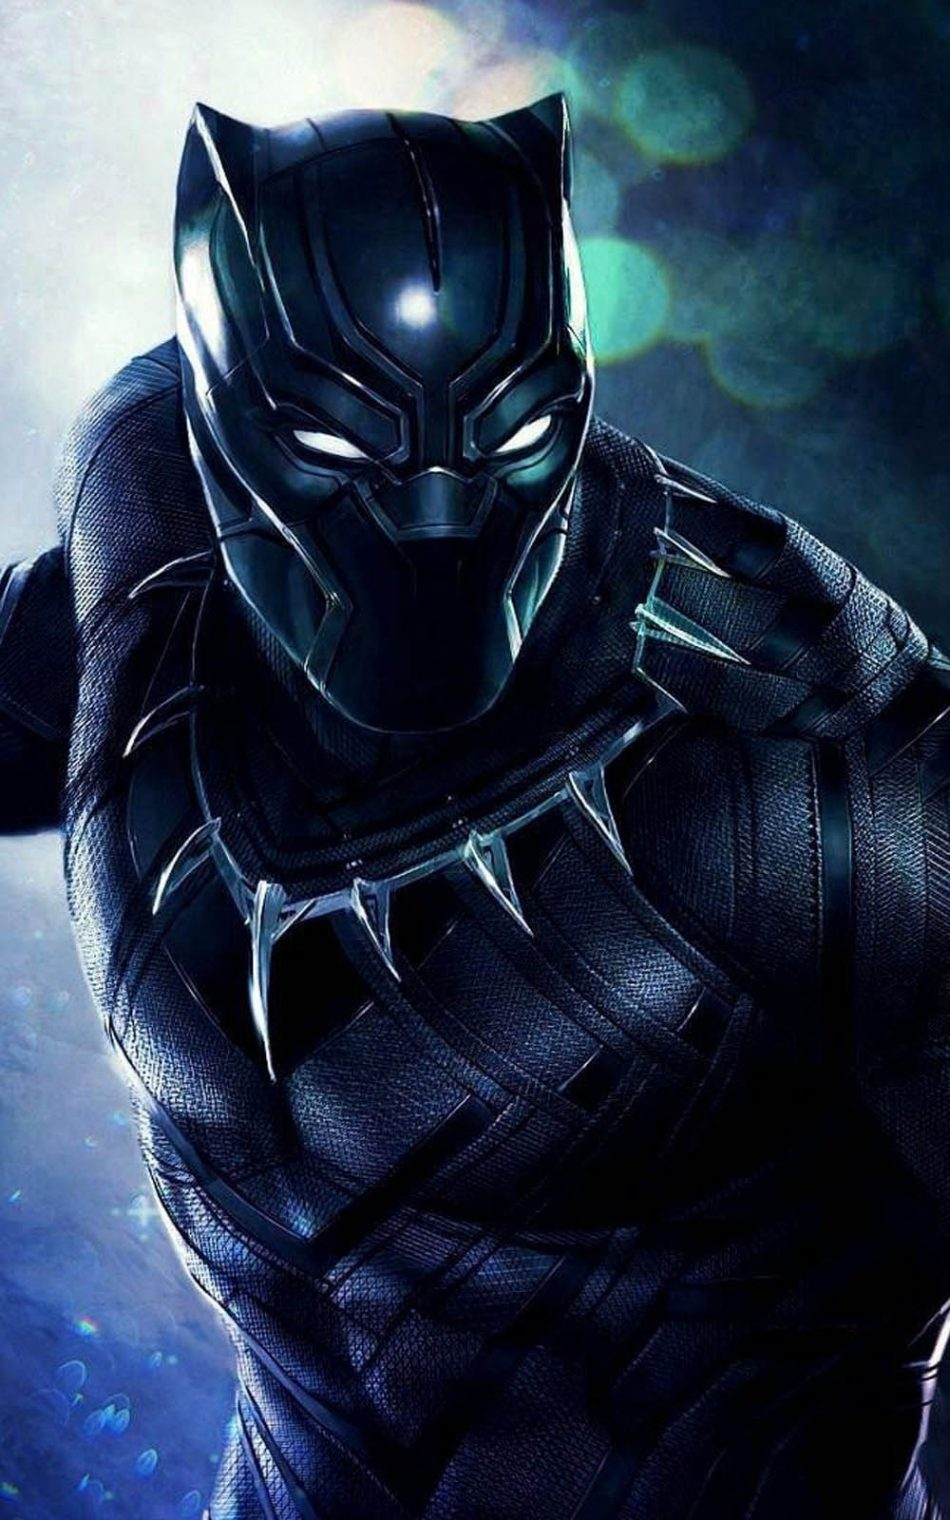 Download Black Panther Artwork Free Pure 4k Ultra Hd Mobile Wallpaper